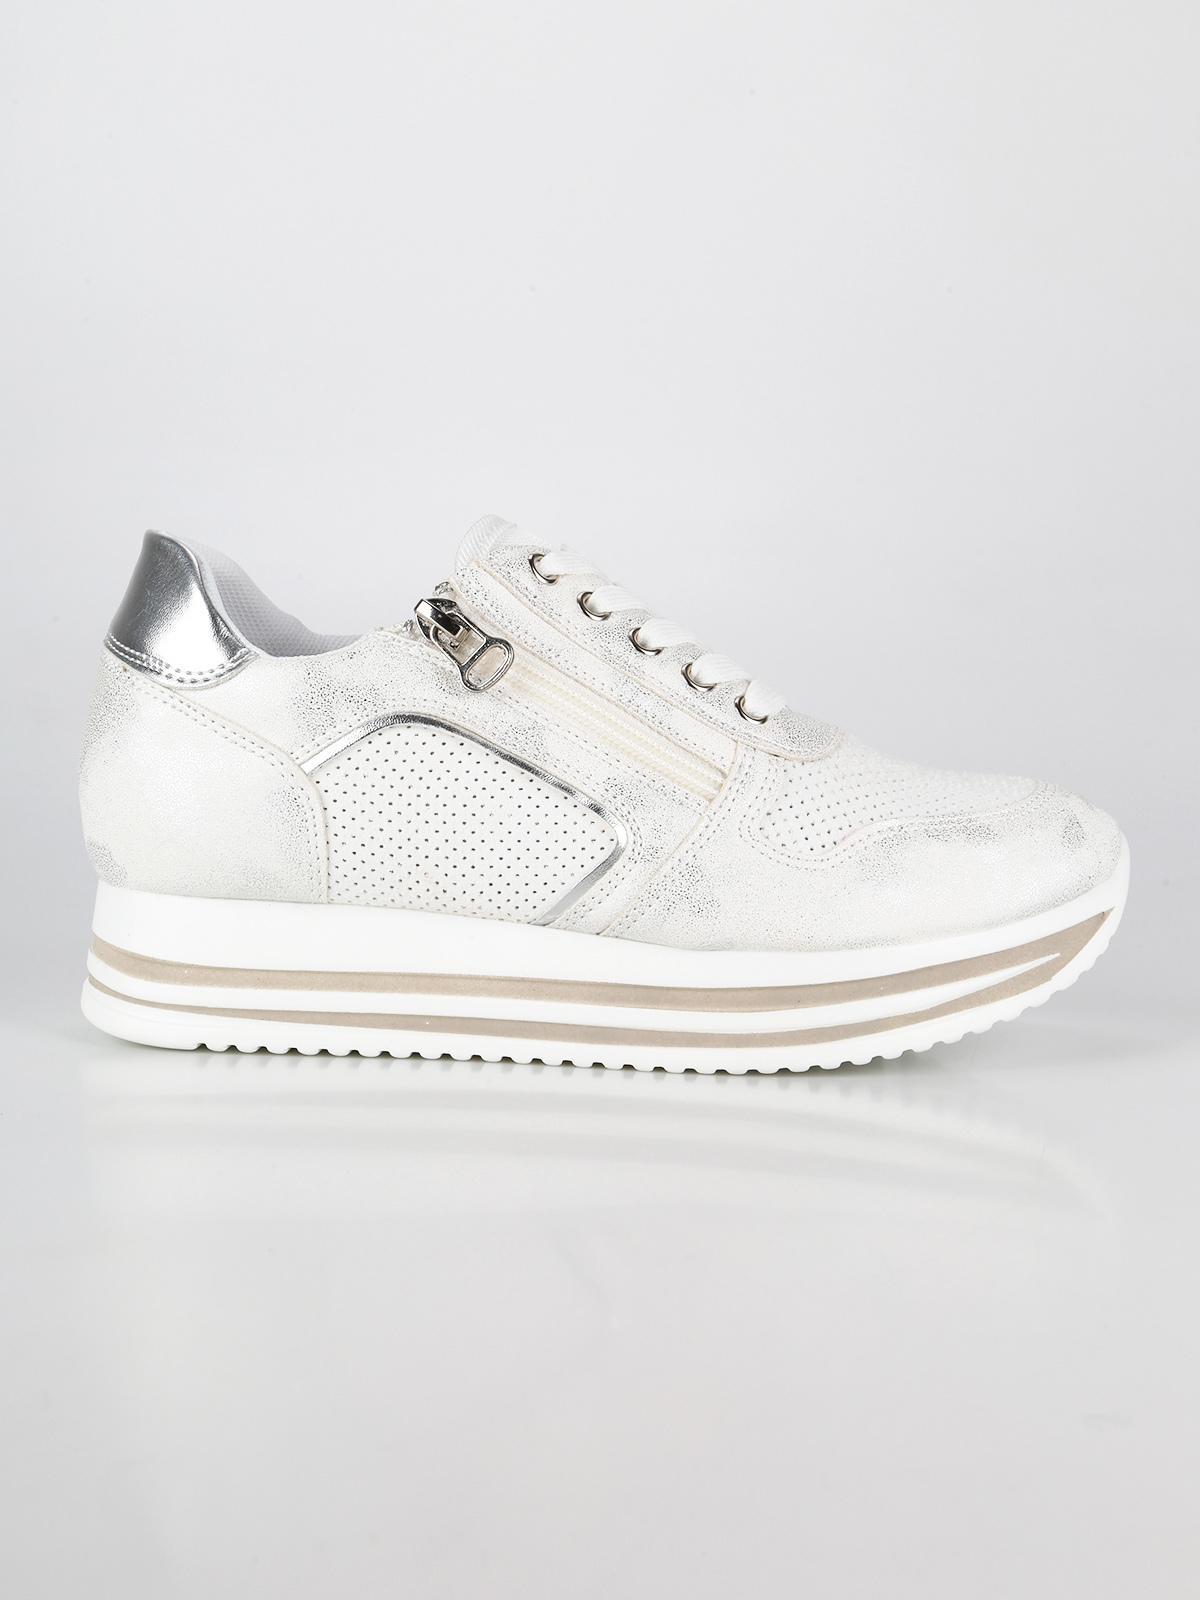 new styles d2fb5 506e9 Scarpe casual con zeppa interna energy footwear | MecShopping